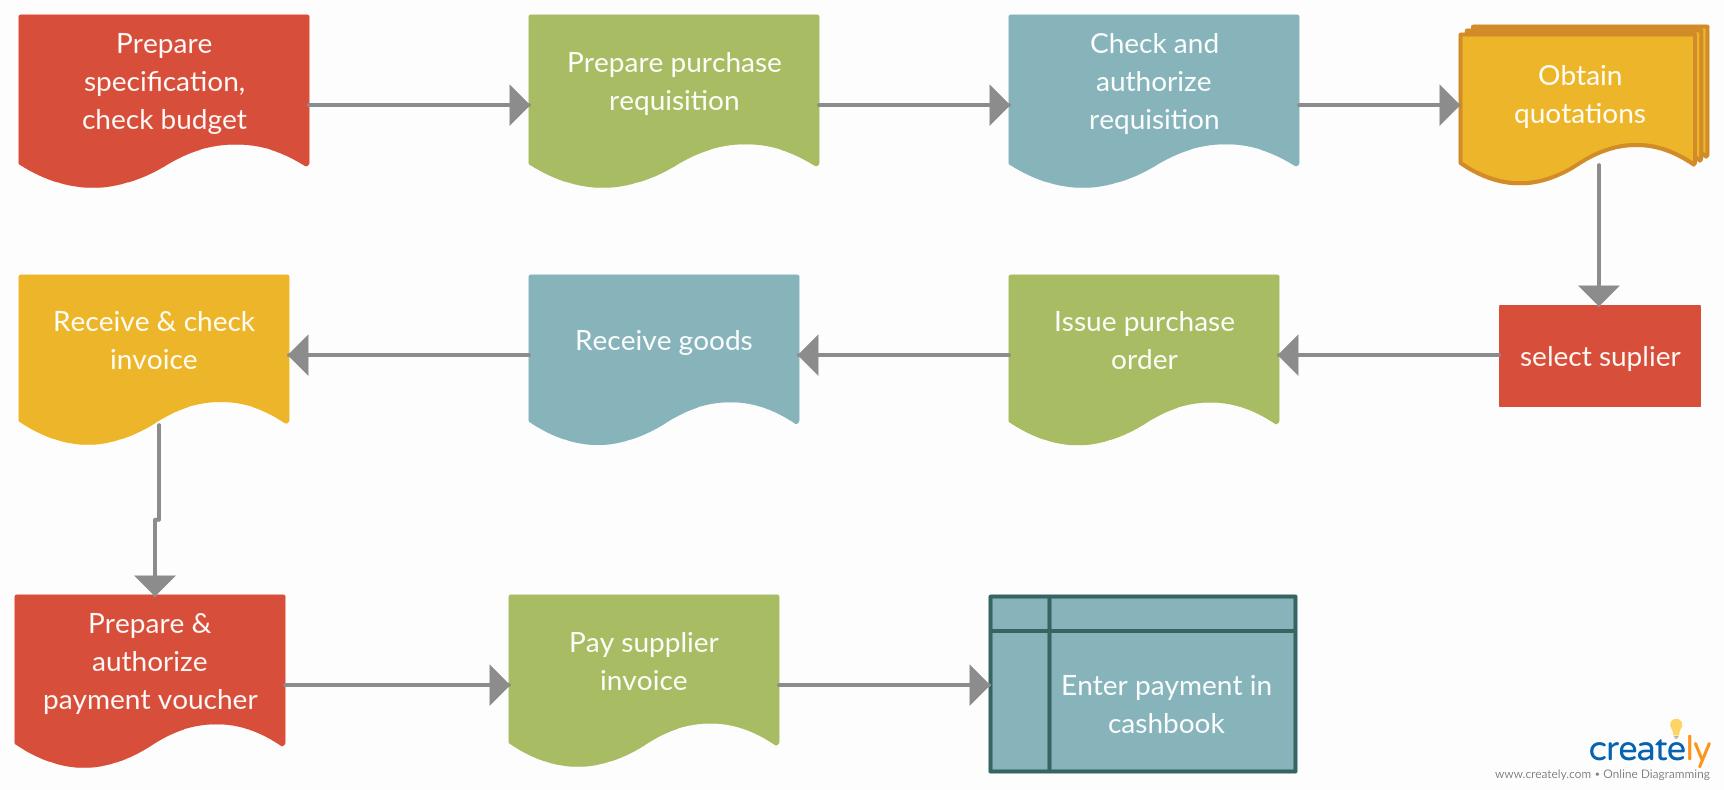 Procurement Process Flow Chart Elegant Procurement Process Flowchart You Can Edit This Template and Create Your Own Diagram Creately